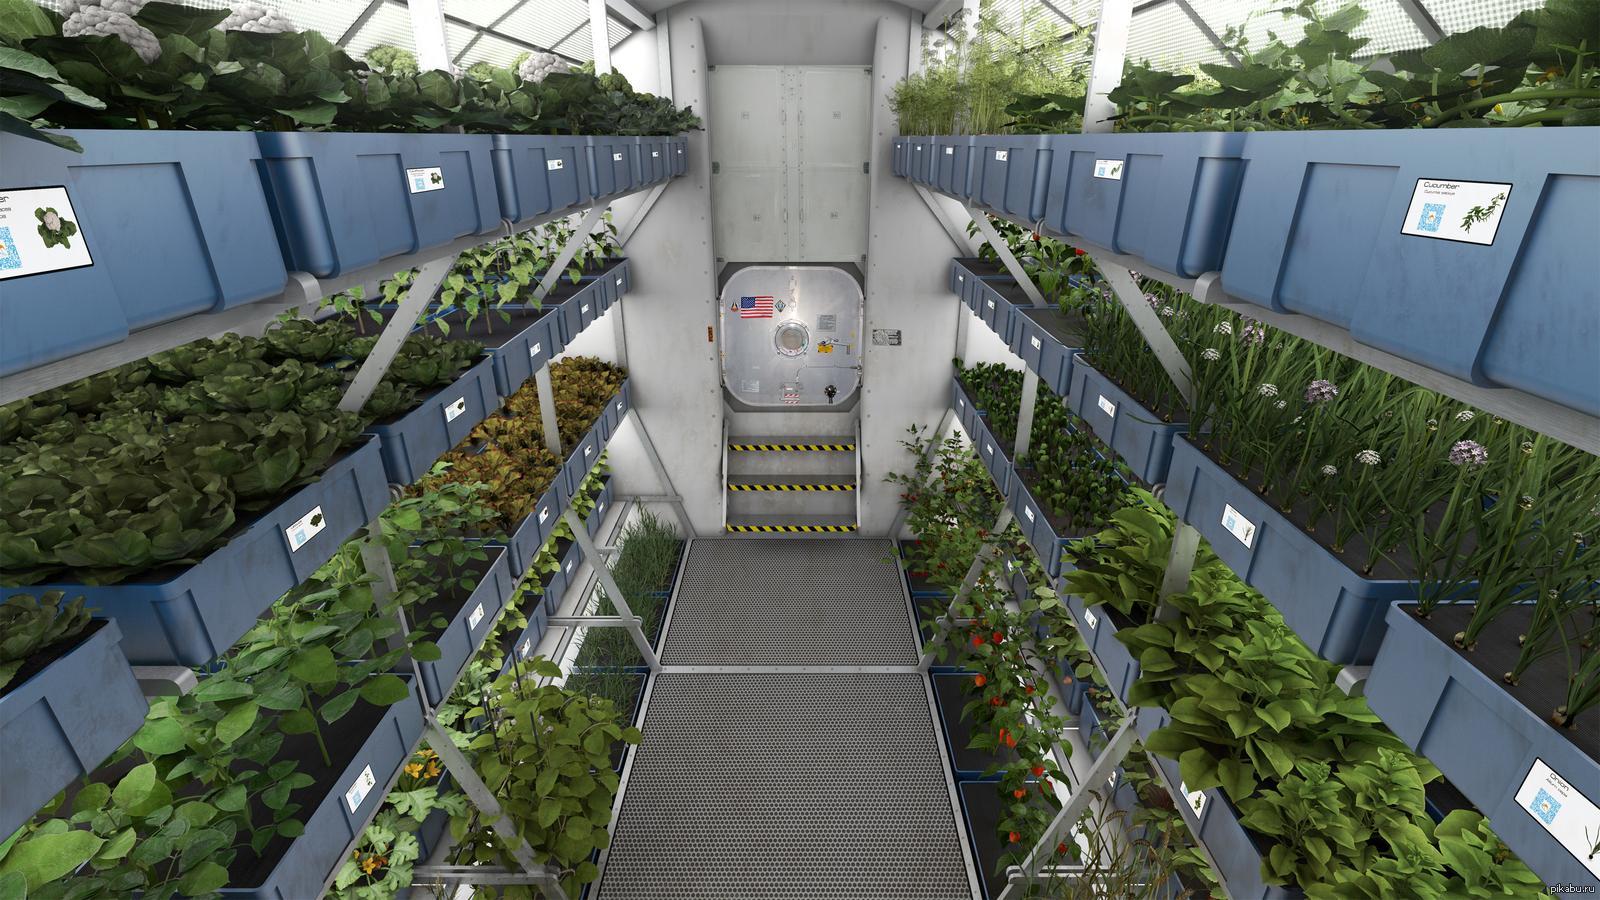 Картинки по запросу выращивание растений на орбите